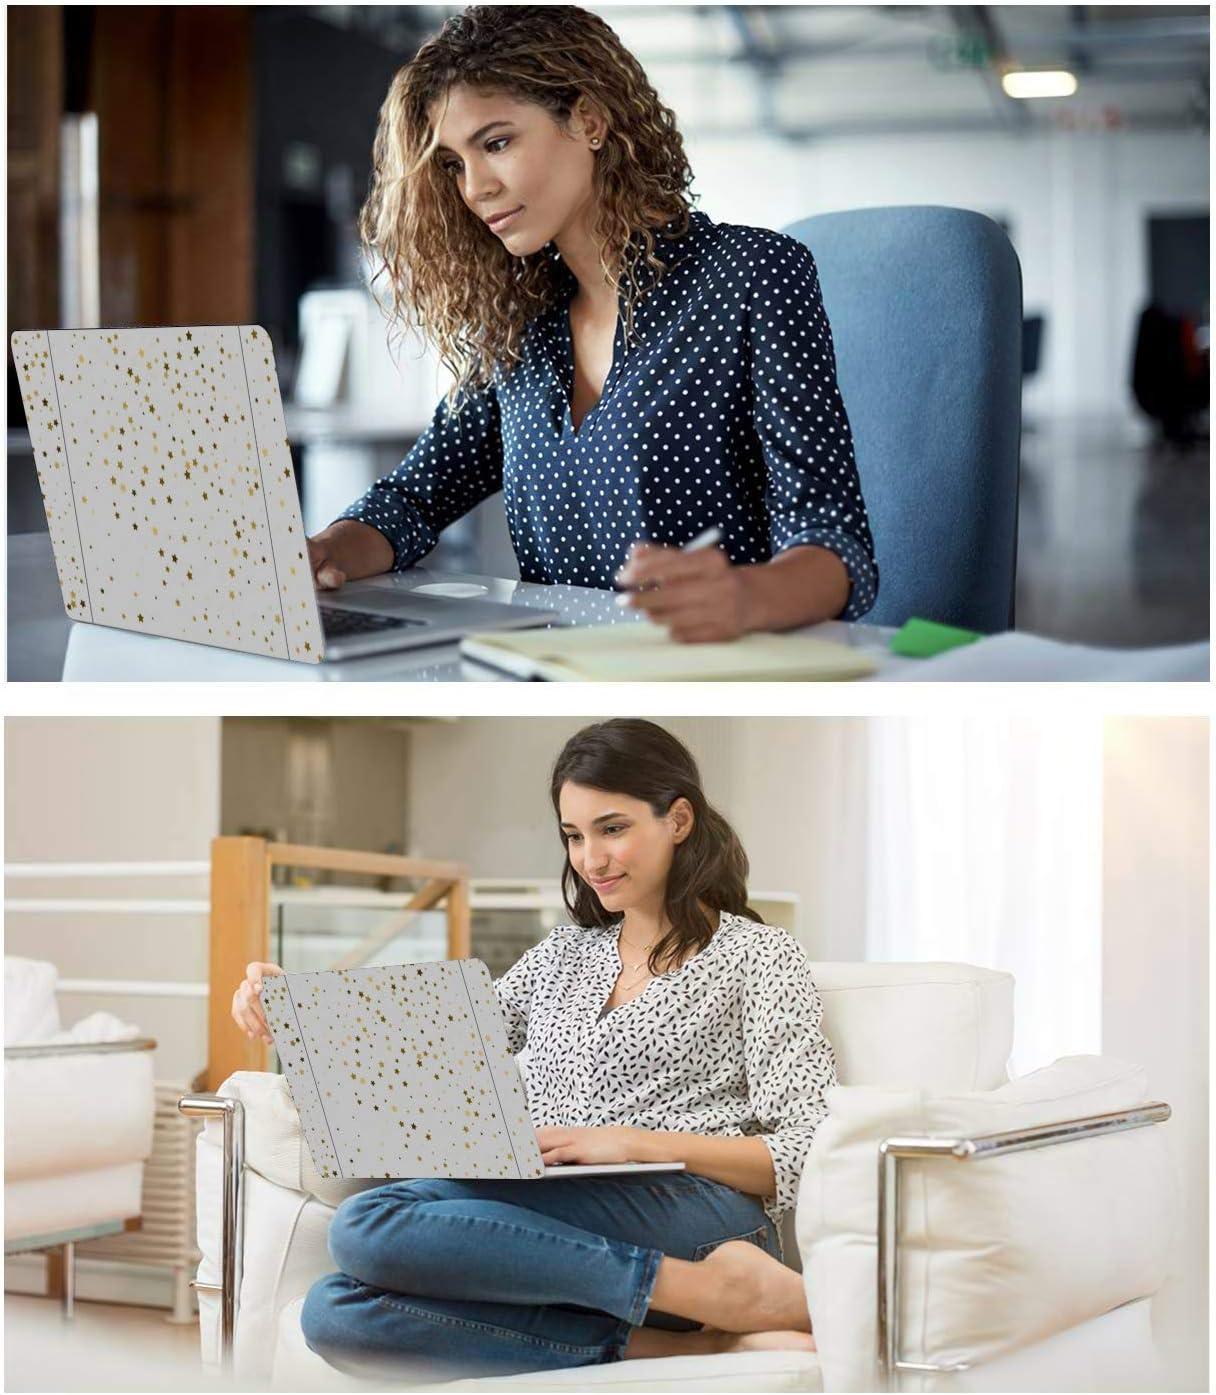 Protective MacBook Pro Case Shiny Retro Noble Pentagram Sky Plastic Hard Shell Compatible Mac Air 11 Pro 13 15 MacBook Pro Laptop Cover Protection for MacBook 2016-2019 Version